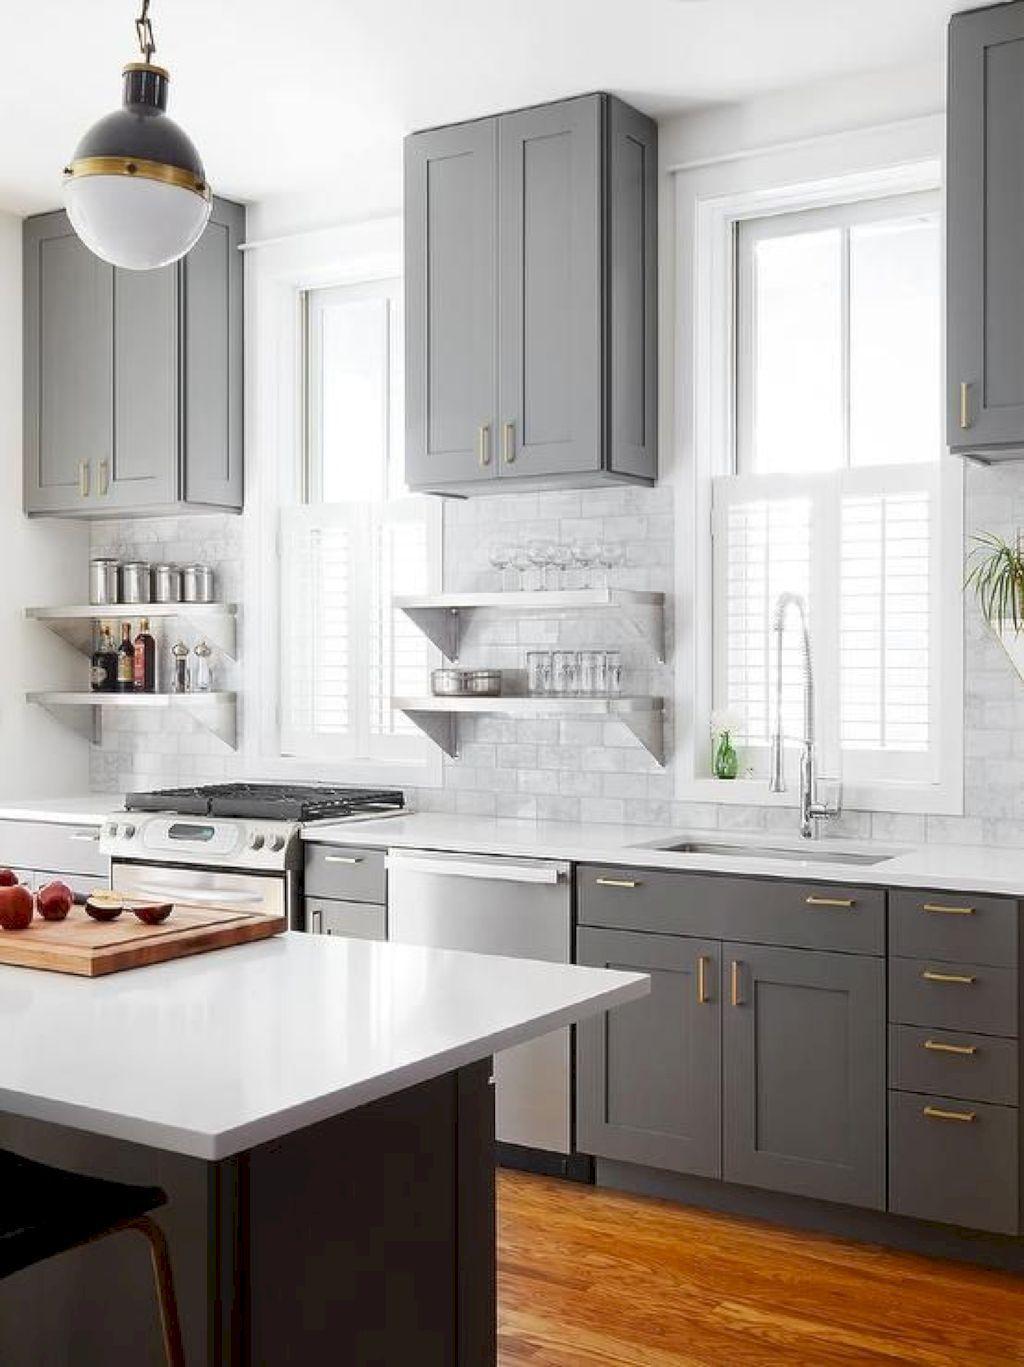 90 gorgeous kitchen cabinets design and decor ideas kitchen rh pinterest com